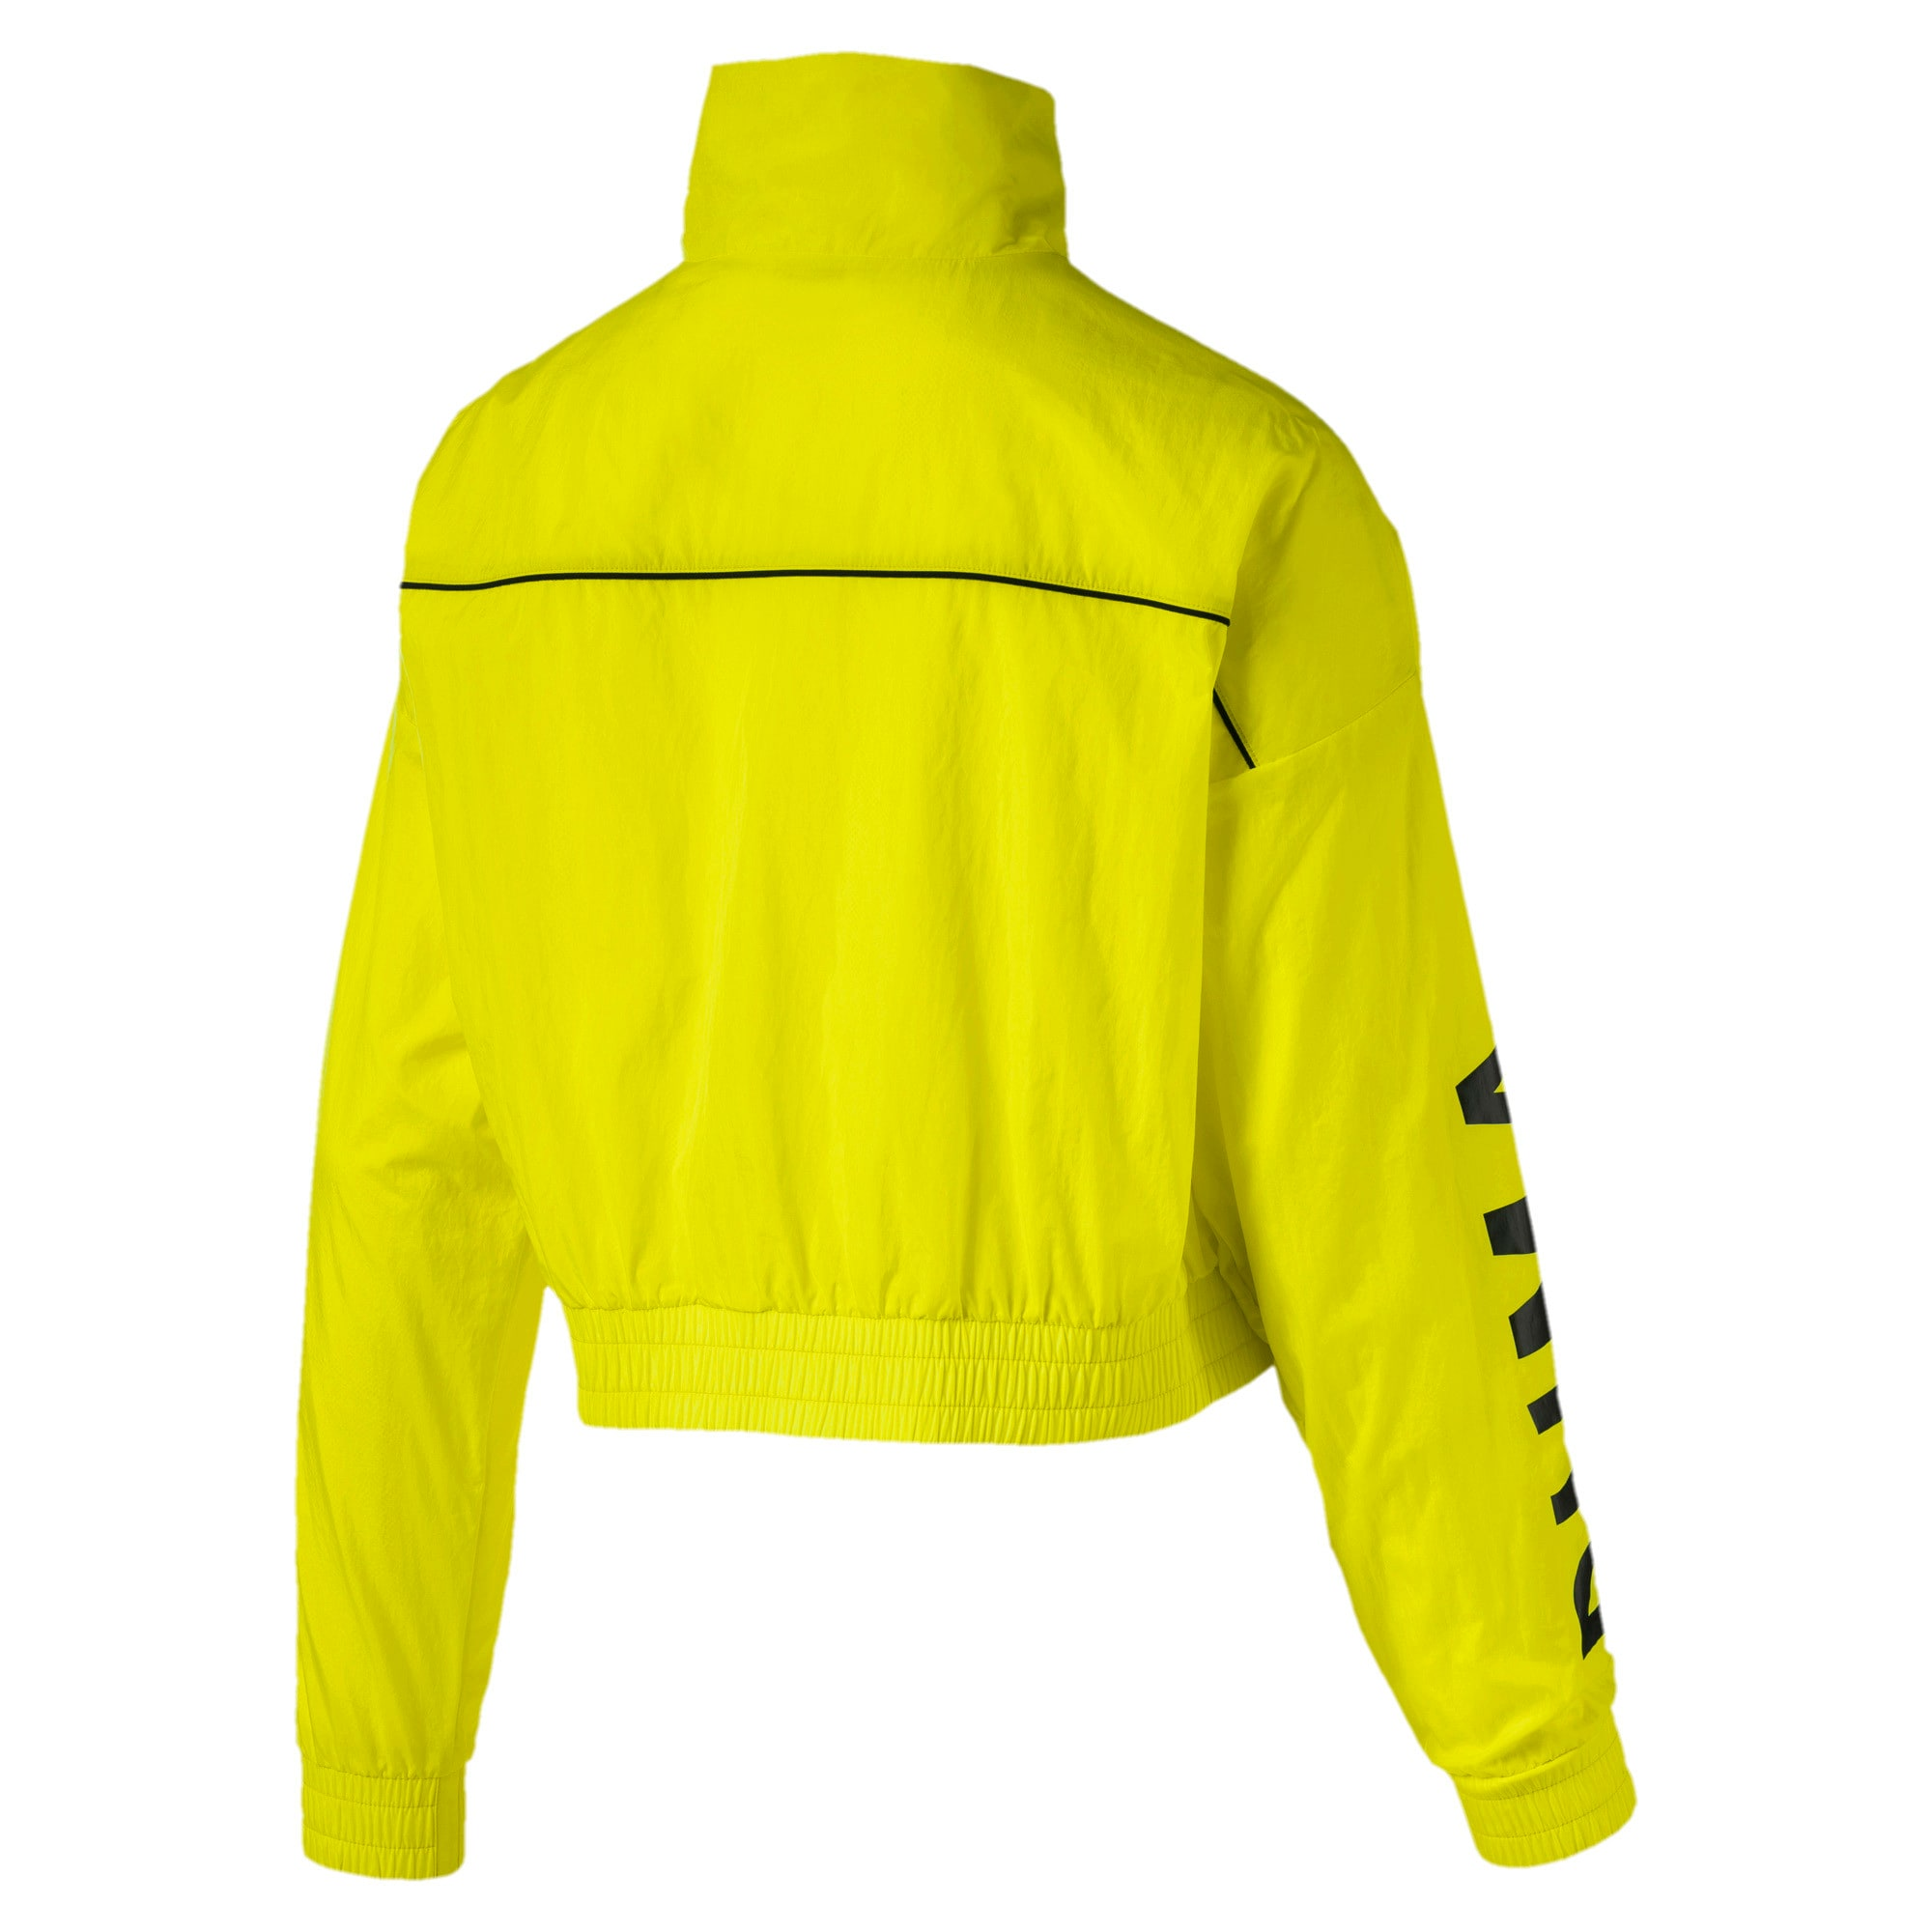 Thumbnail 5 of Chase Woven Women's Jacket, Yellow Alert, medium